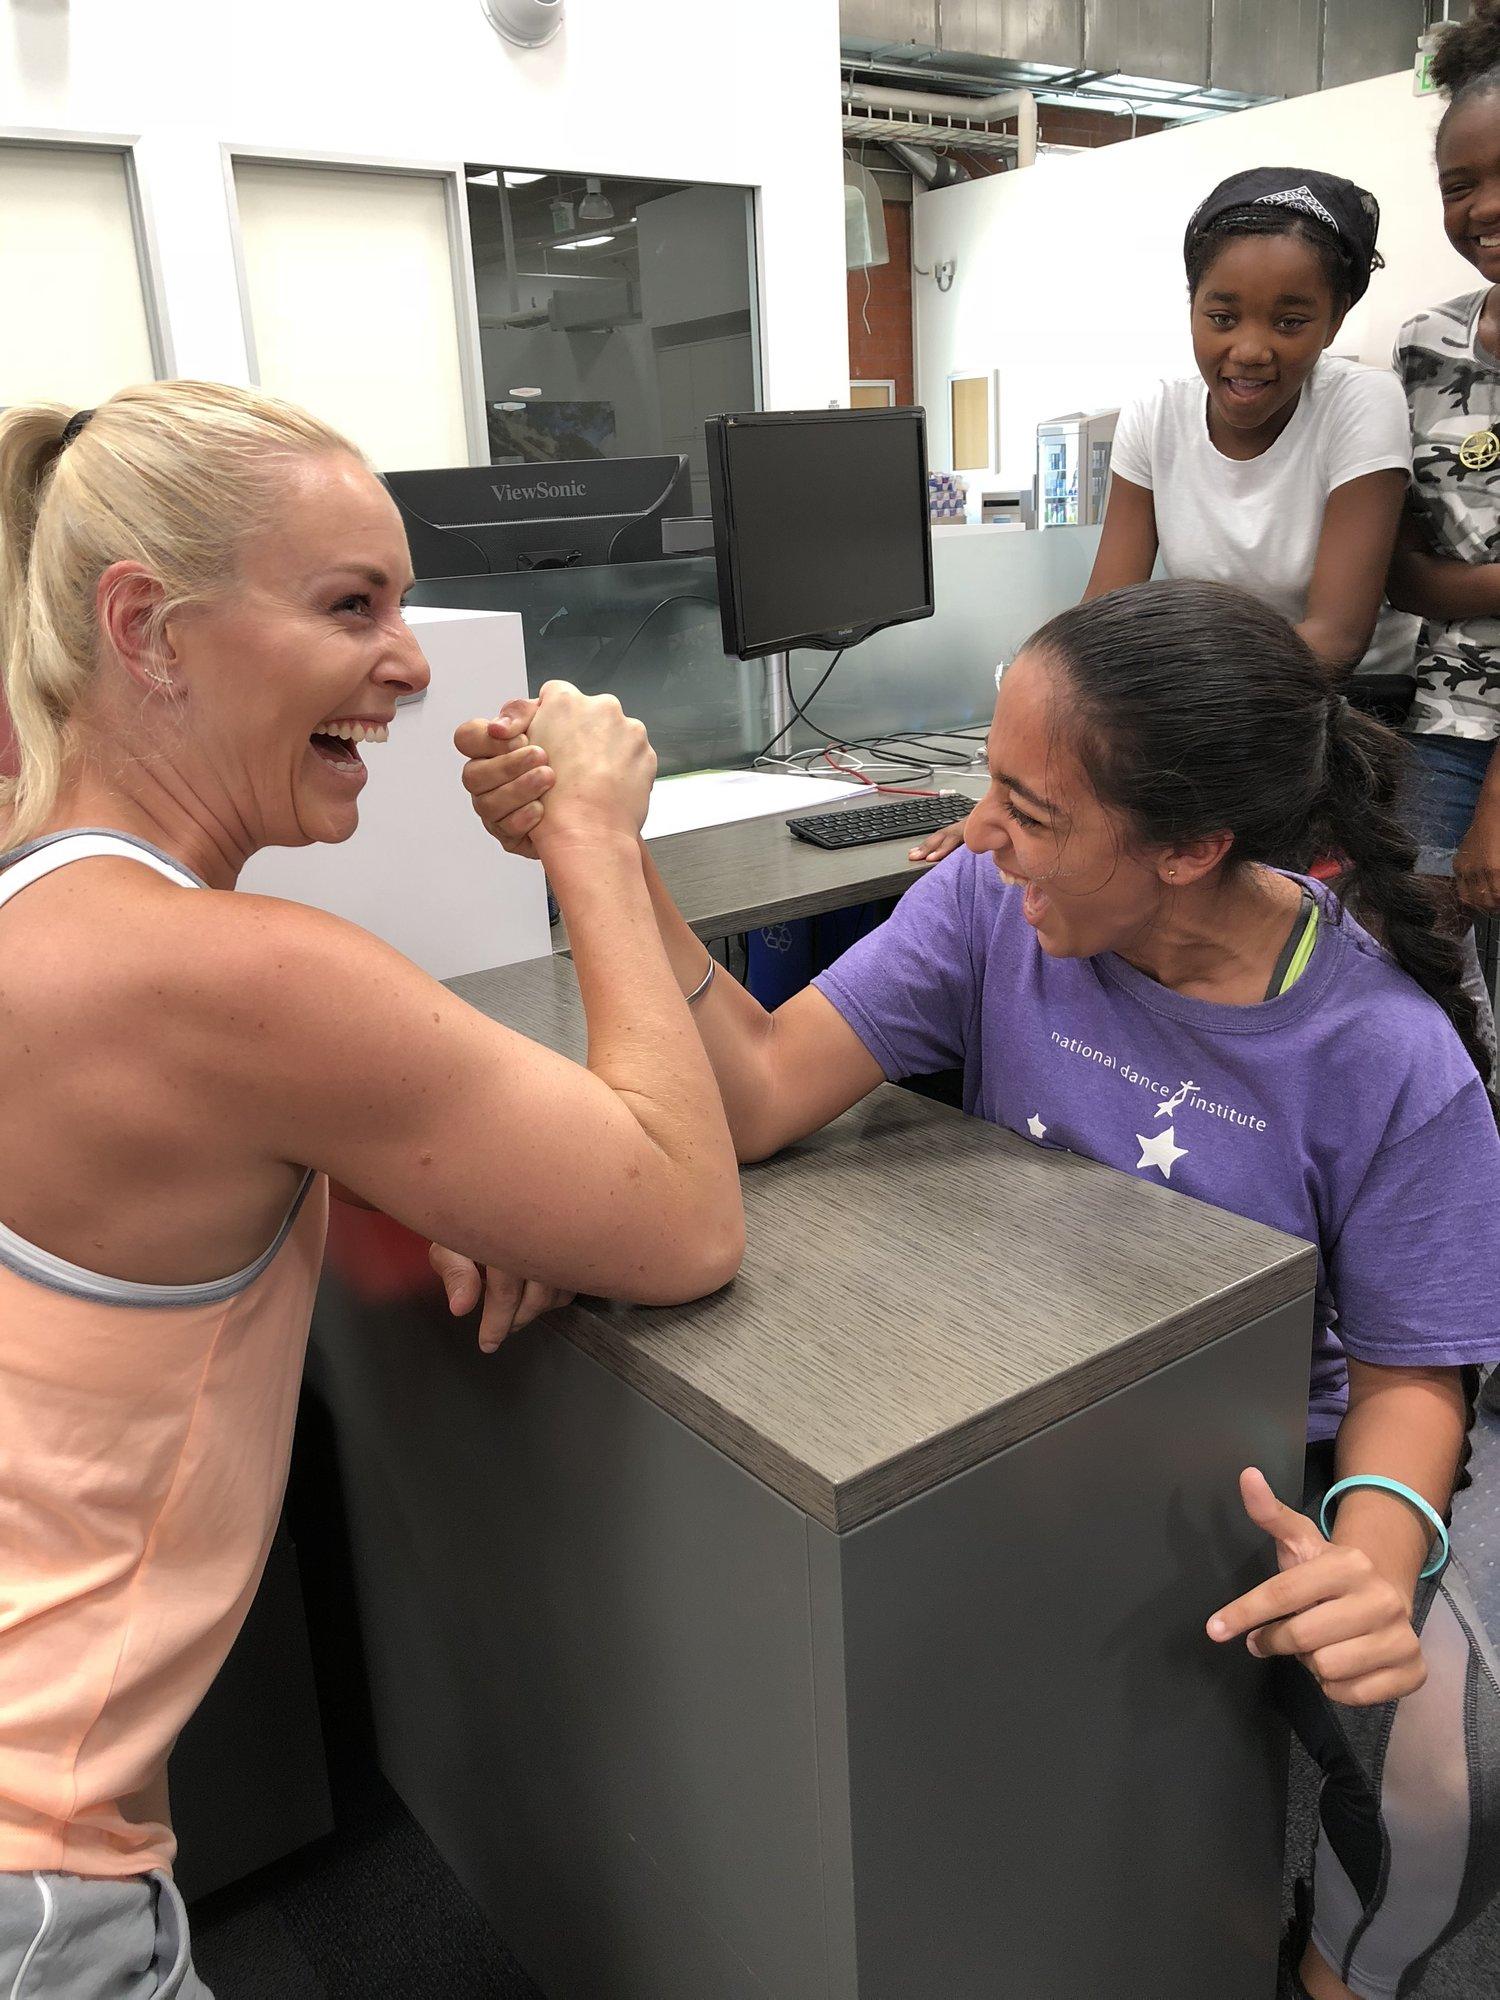 Lindsey taking on an arm-wrestling challenge.